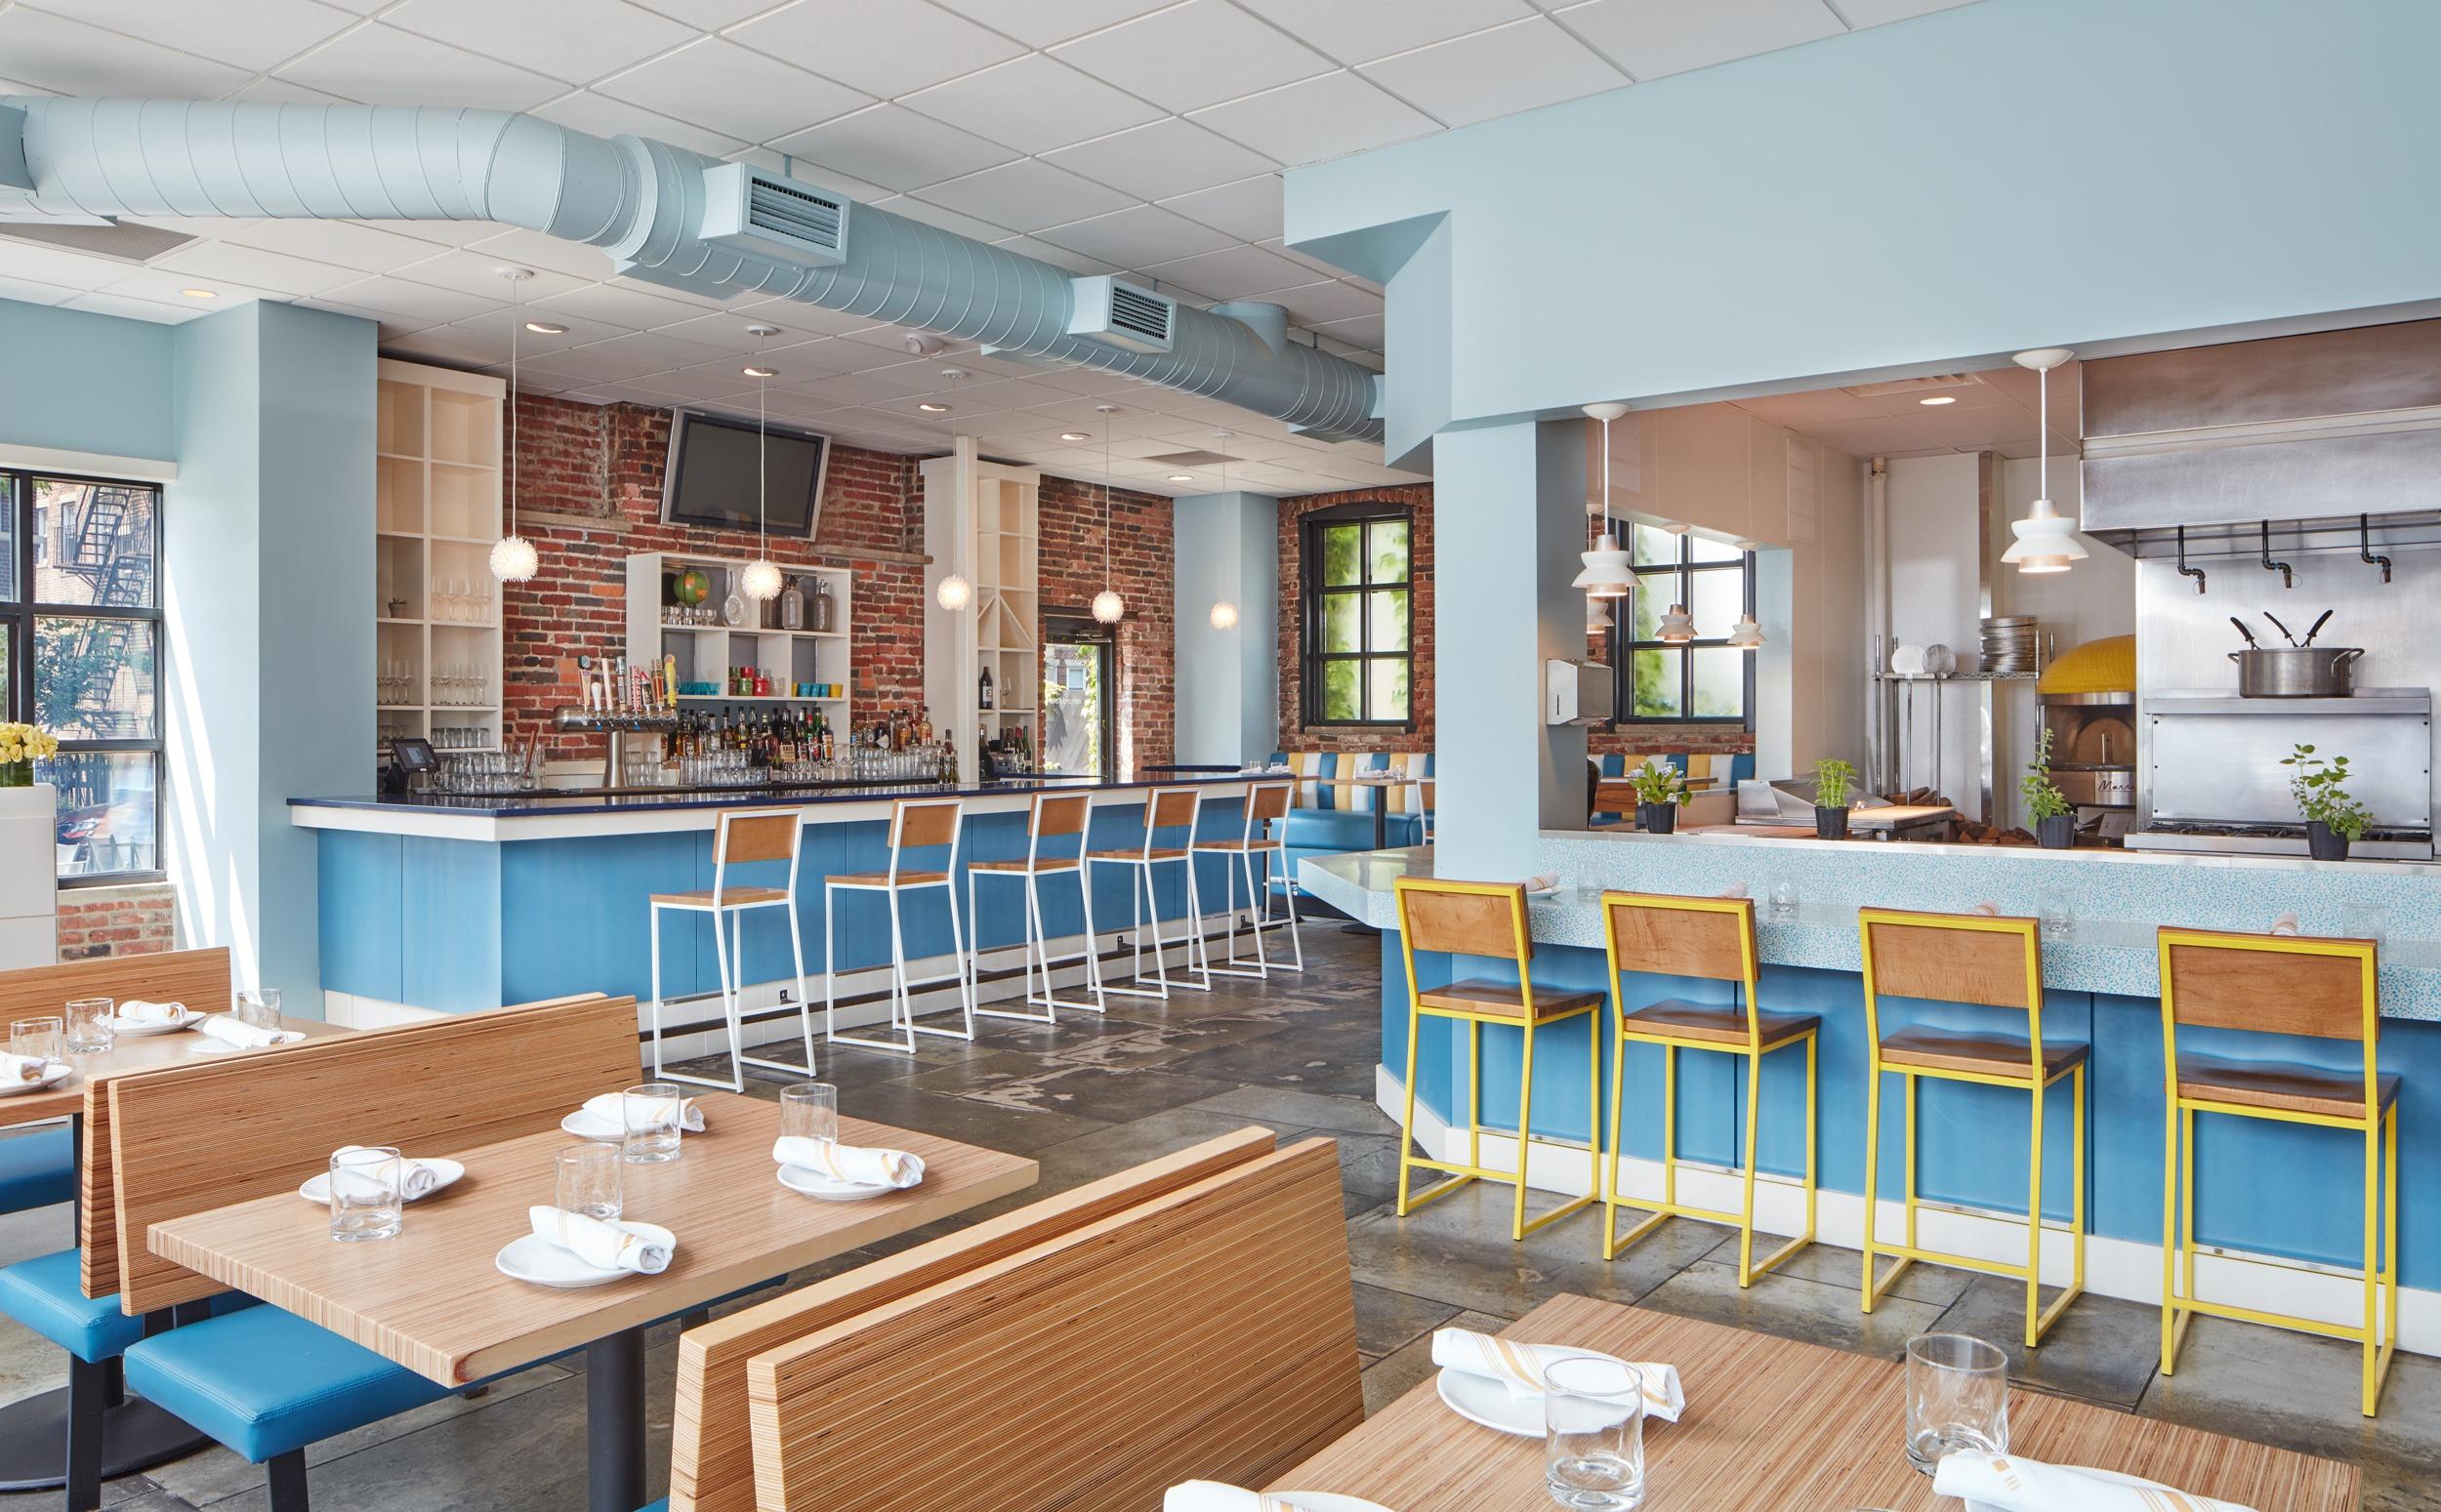 Tapestry colorful restaurant design